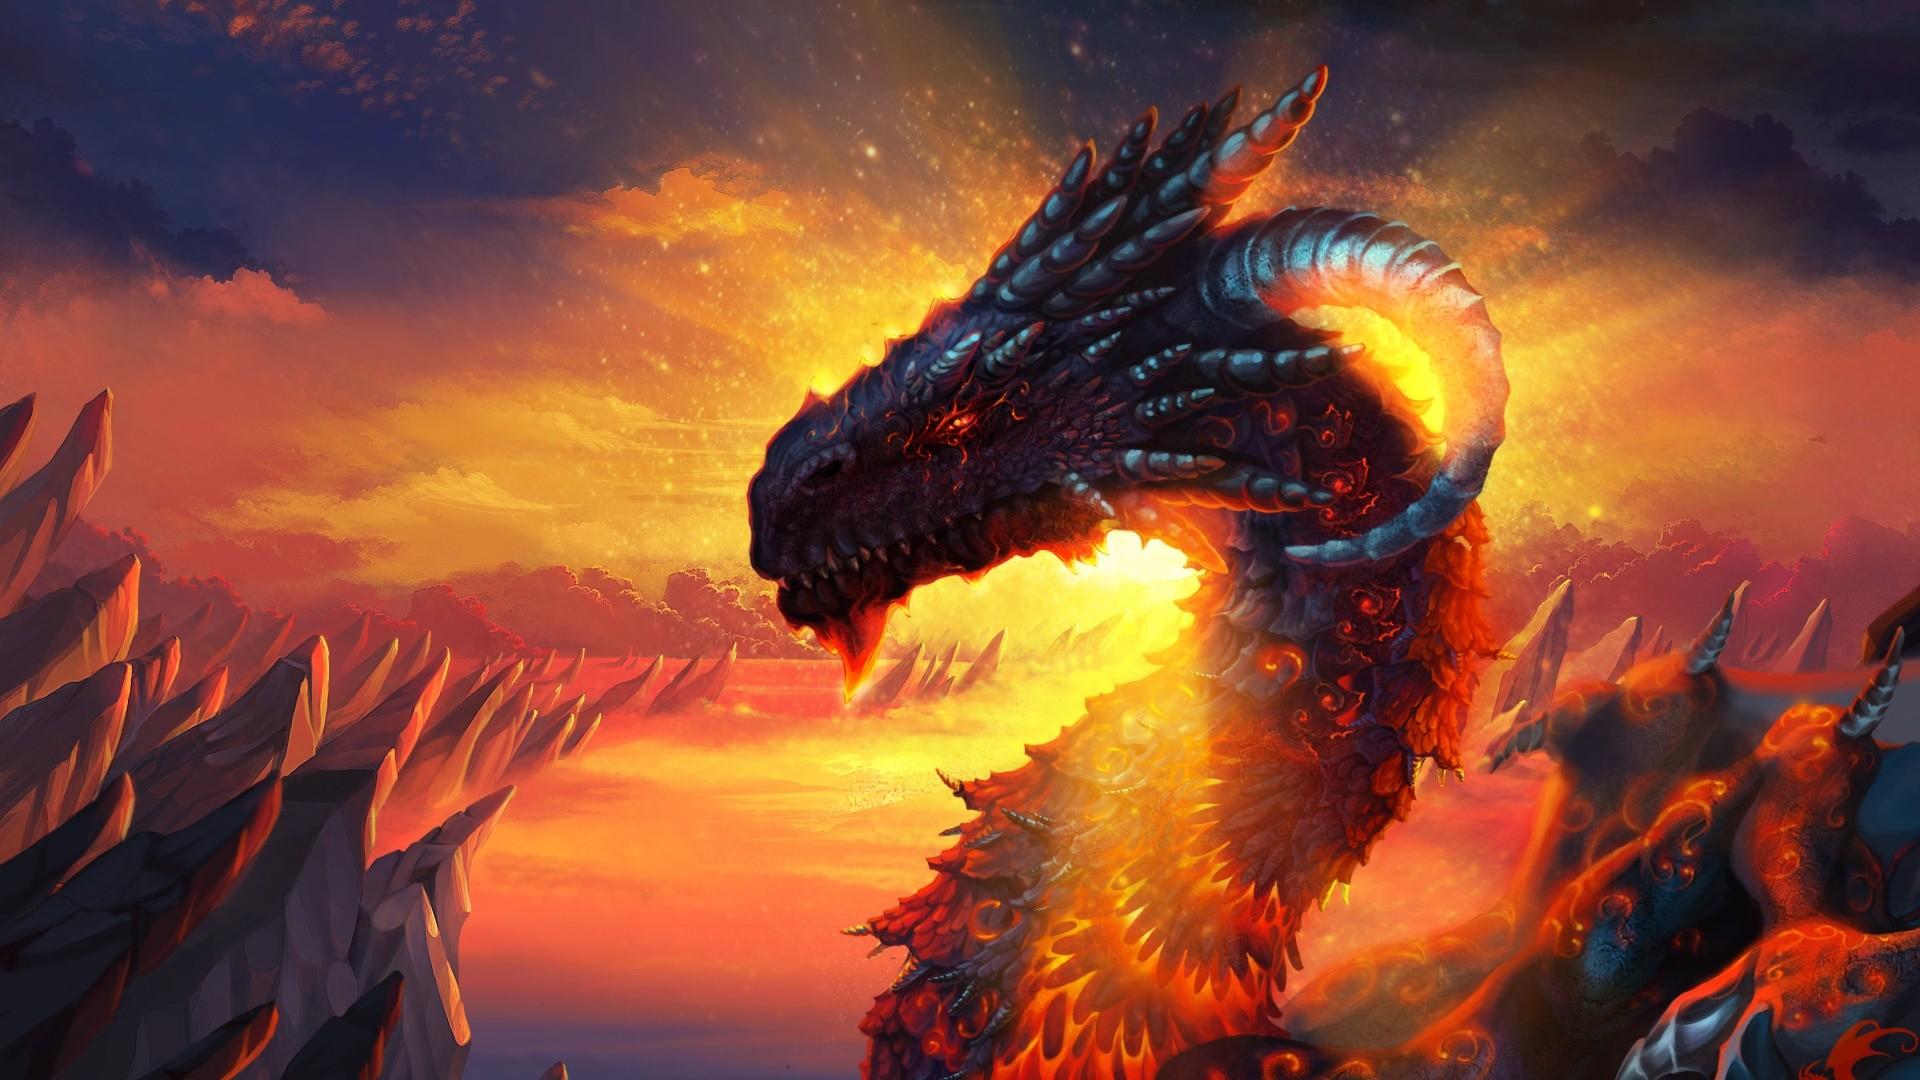 Hd Wallpaper Dragon Dragon lava sky hd wallpaper